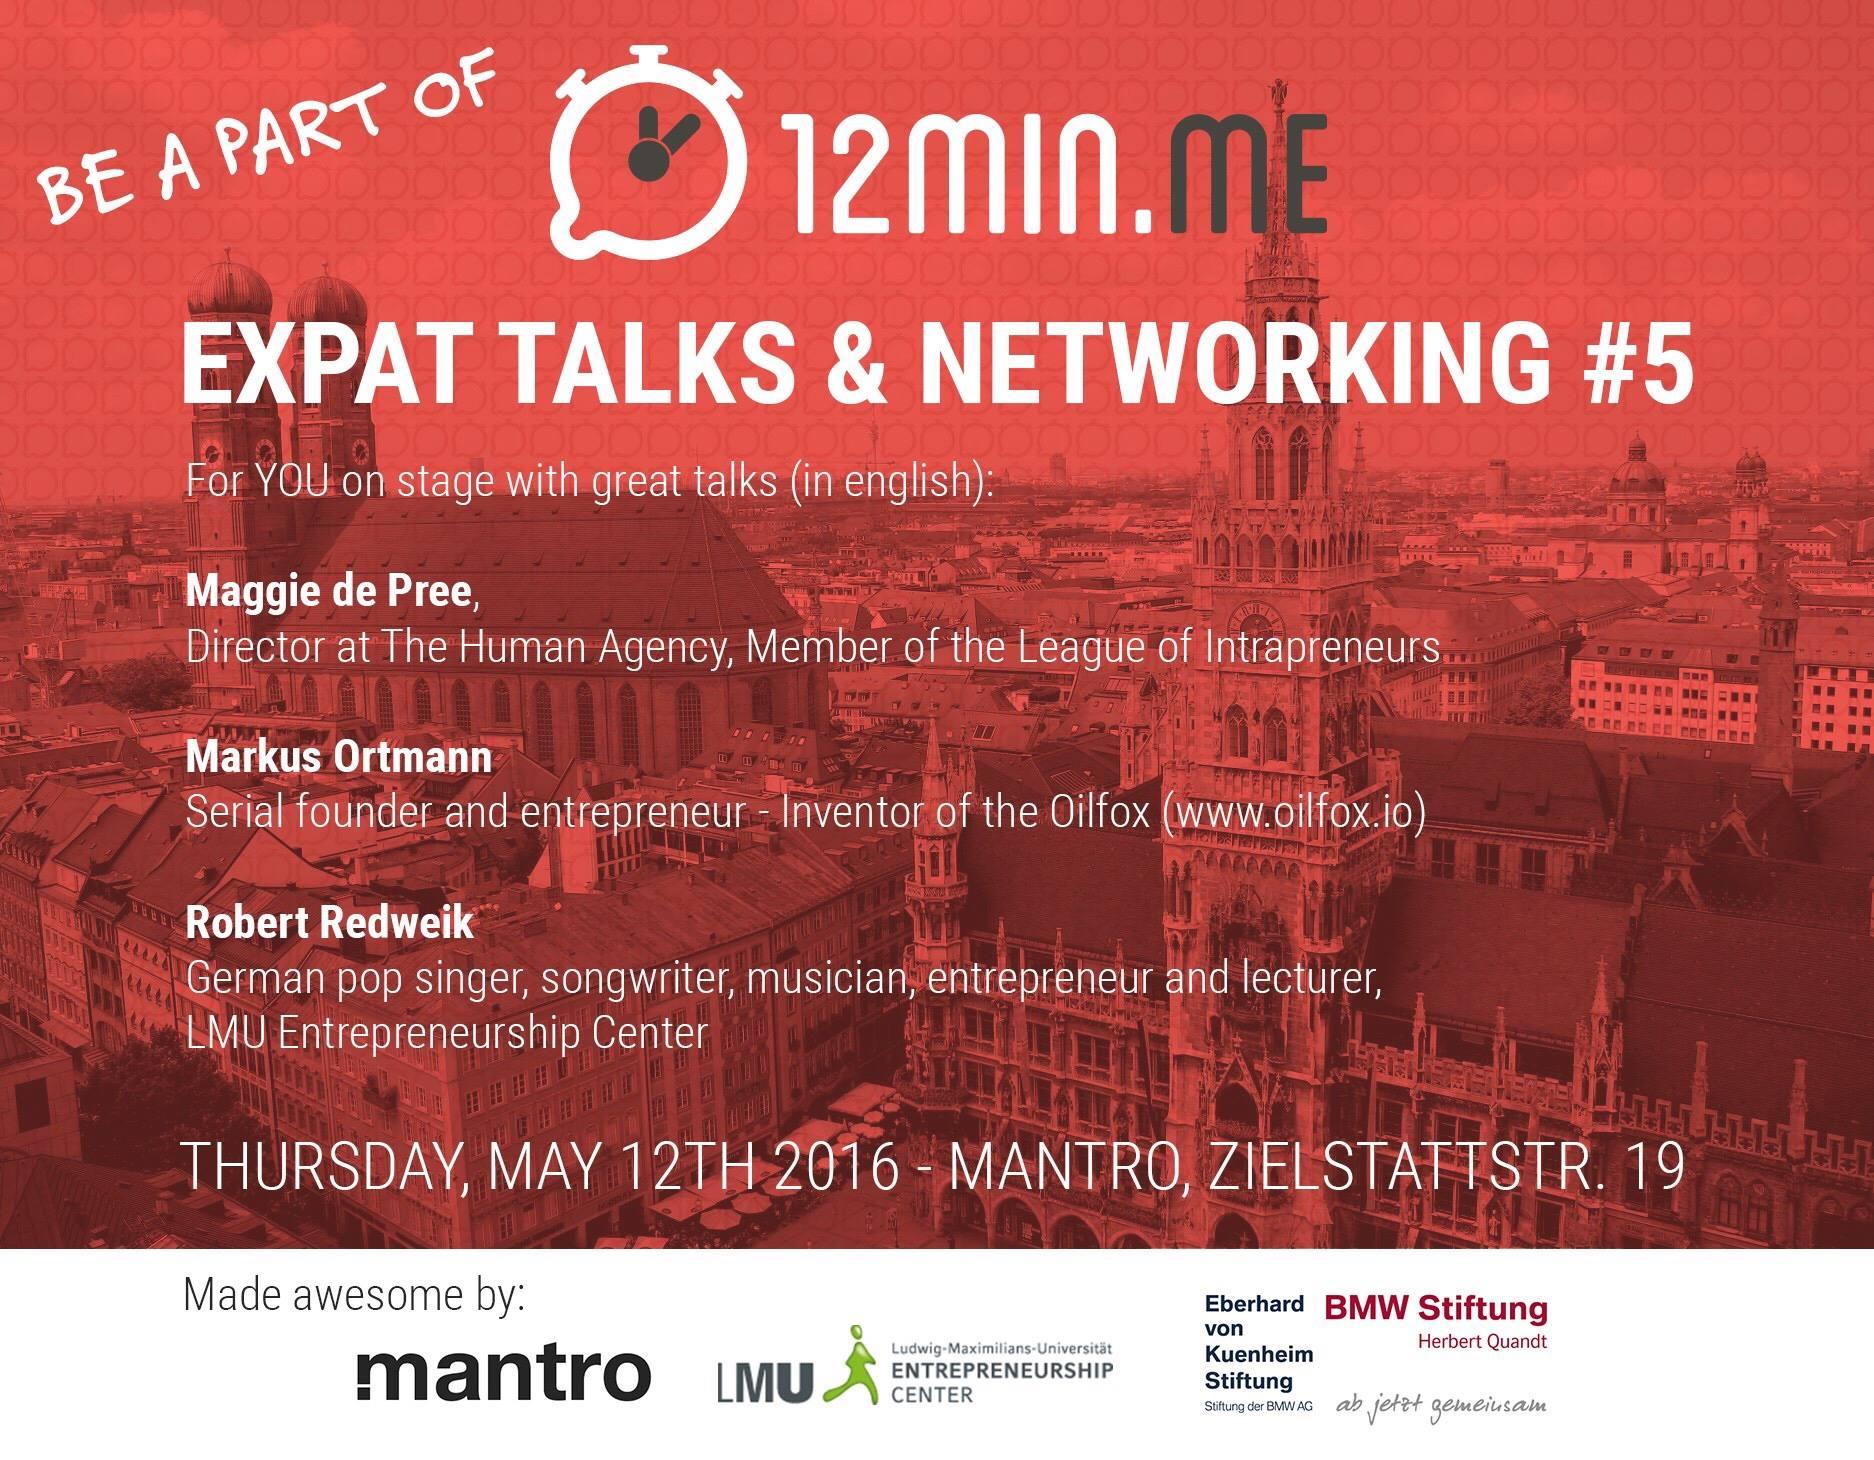 12min.me - EXPAT Talks & Networking #5 am 12. Mai 2016 bei mantro.net in München.